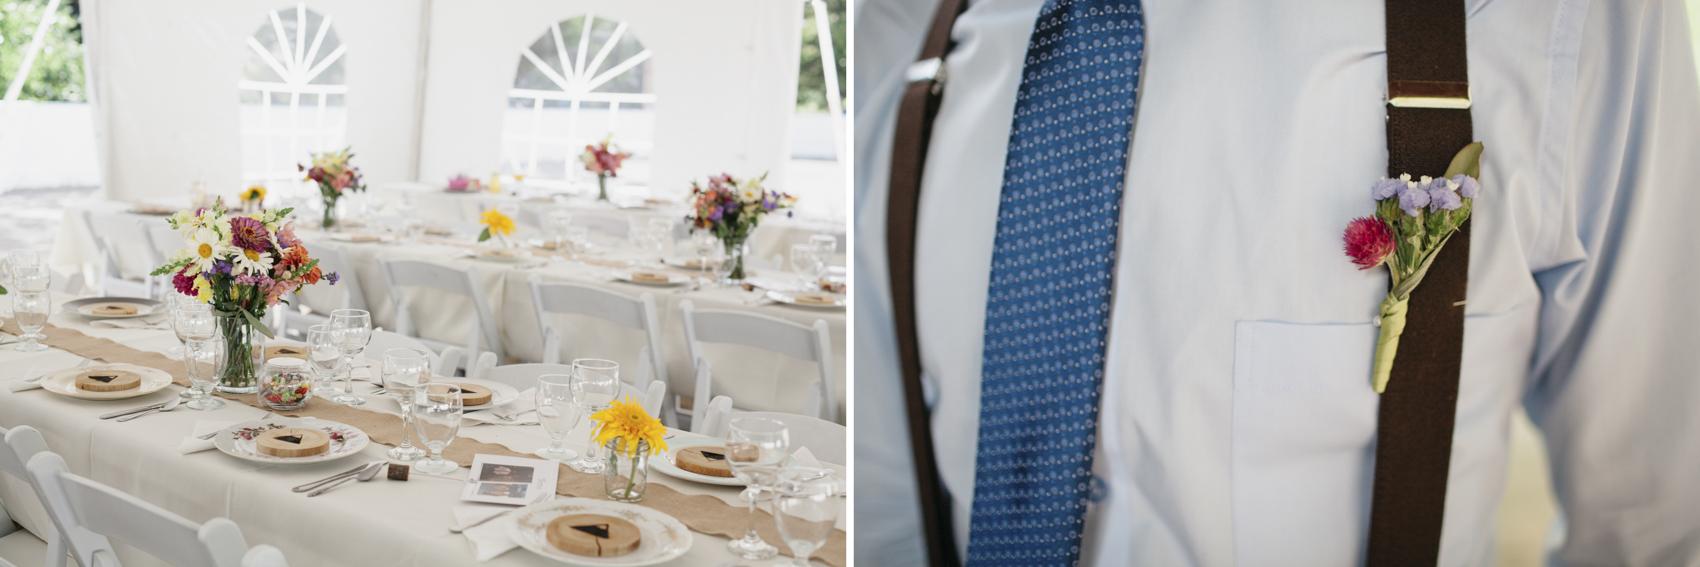 LFA_JuliaGlenn_Sugarloaf_Maine_Wedding007.jpg